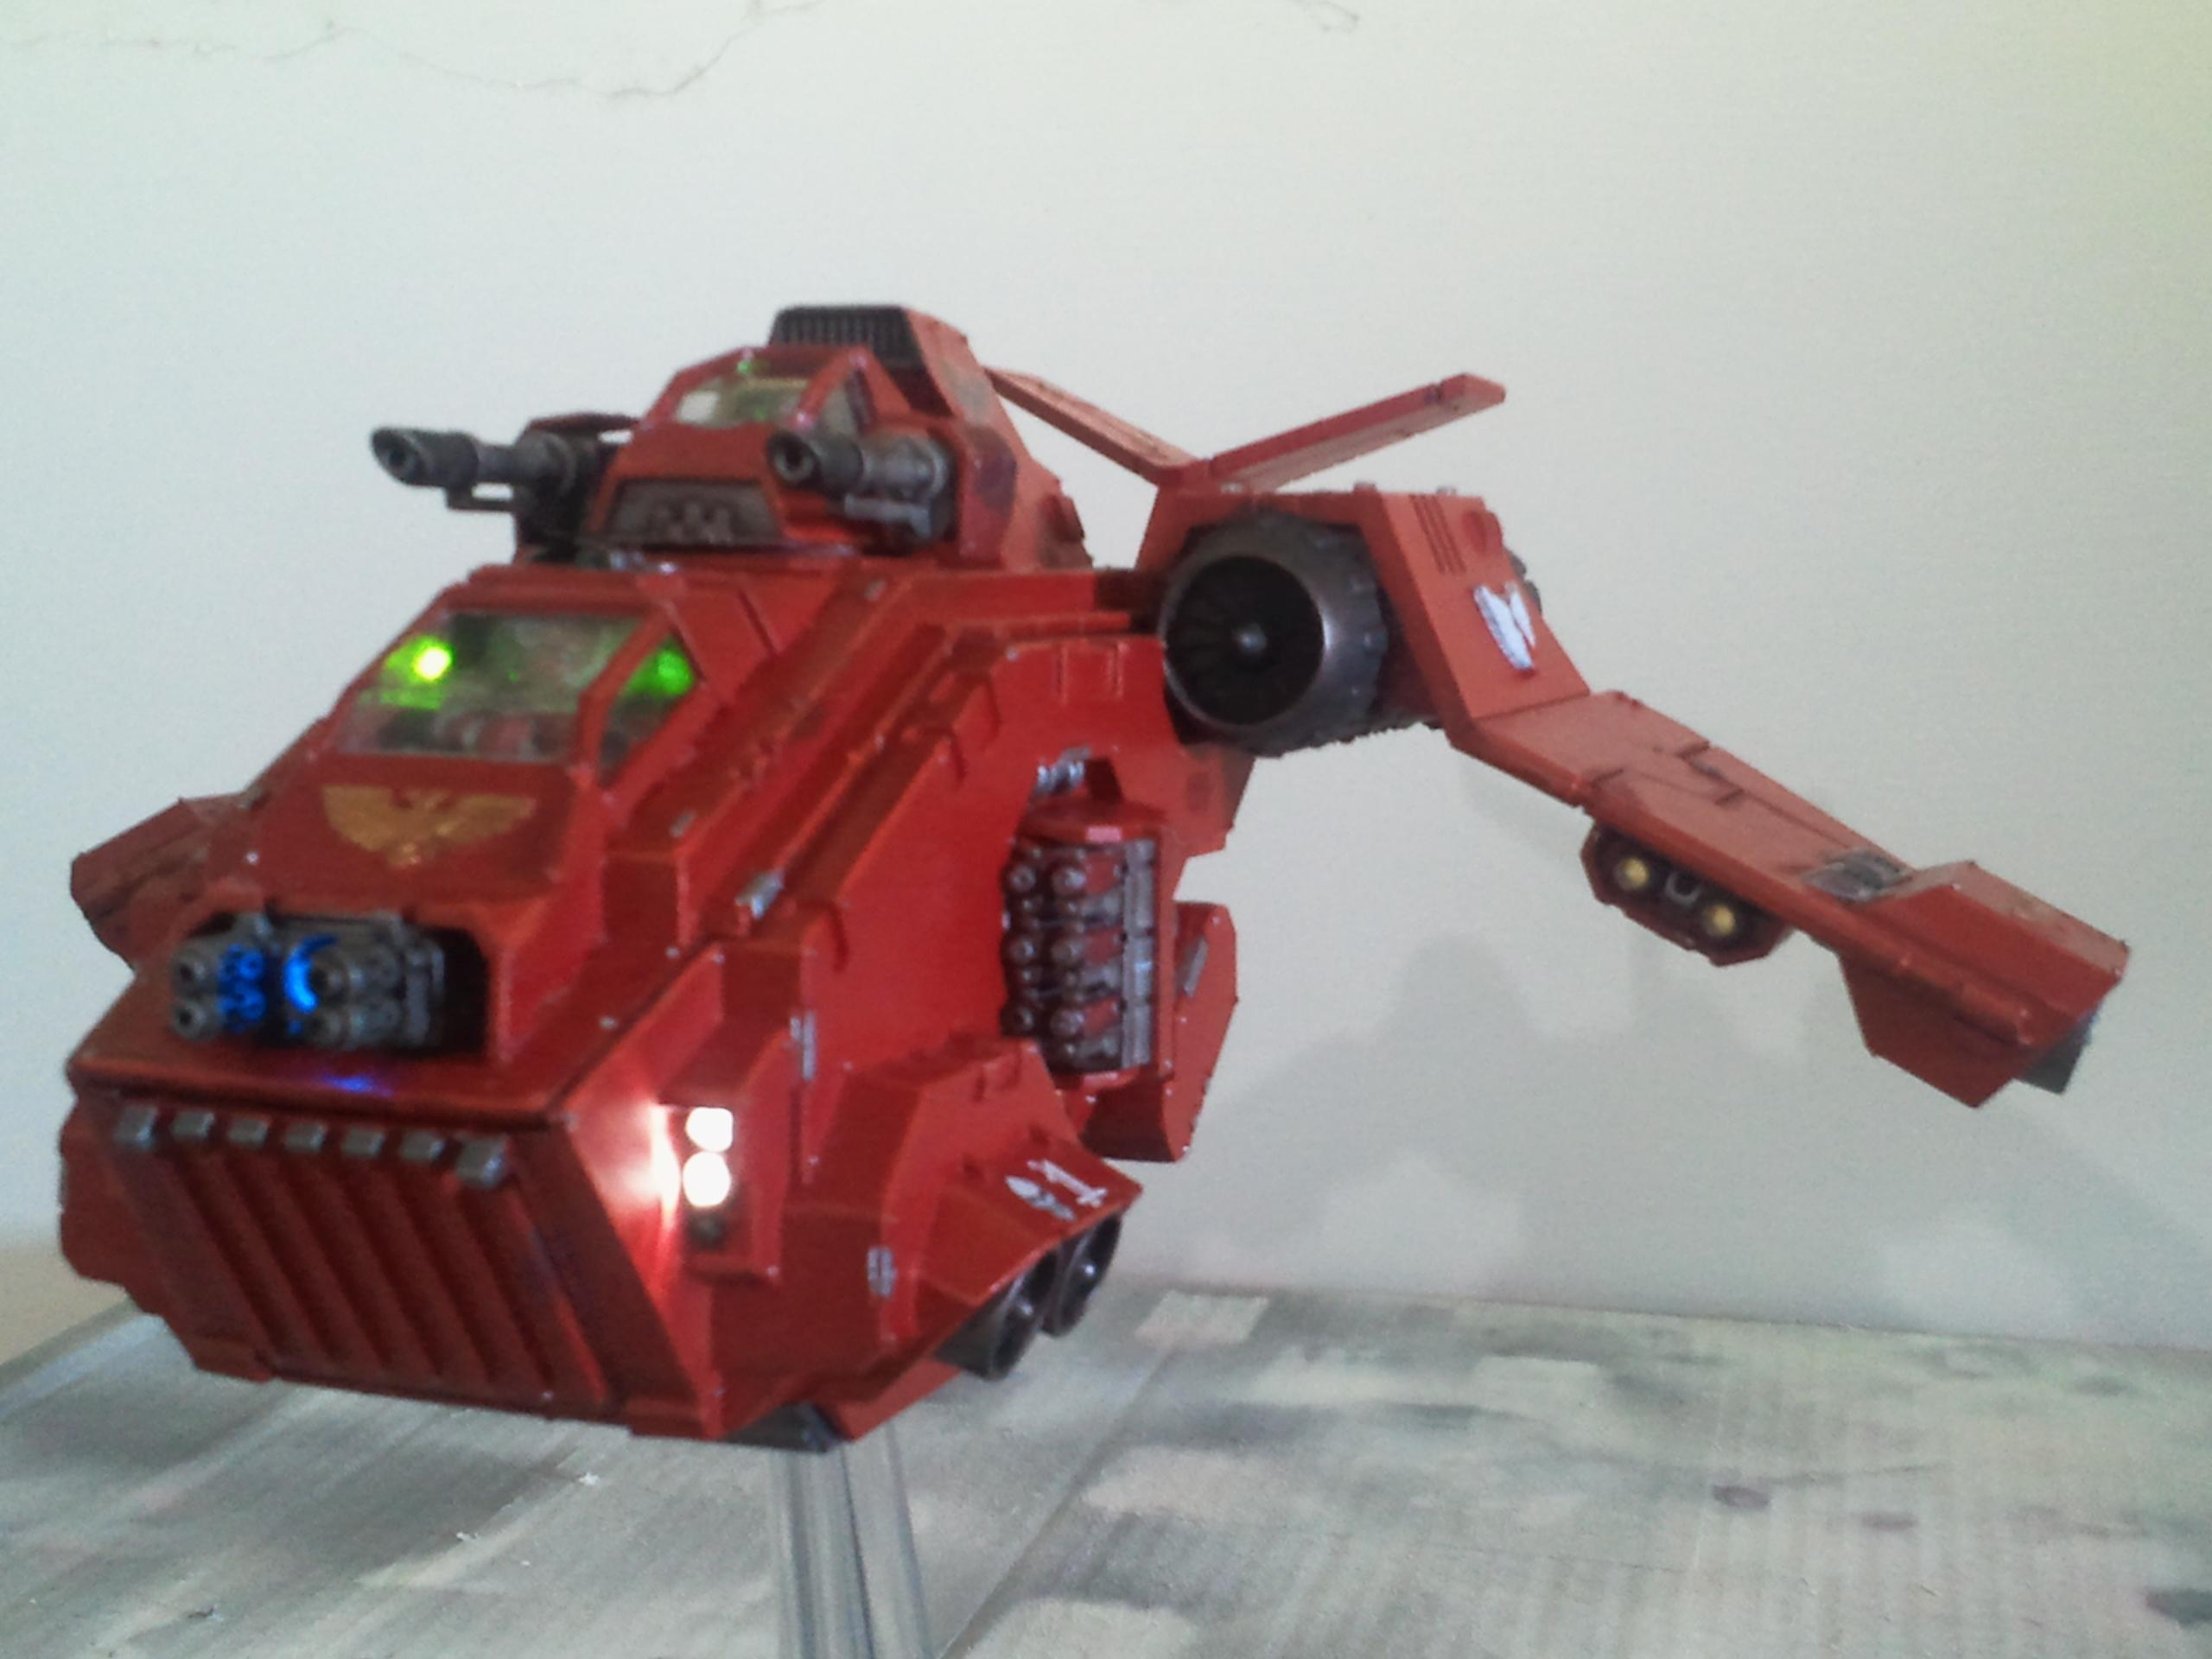 Blood Angels, Space Marines, Stormraven, Warhammer 40,000